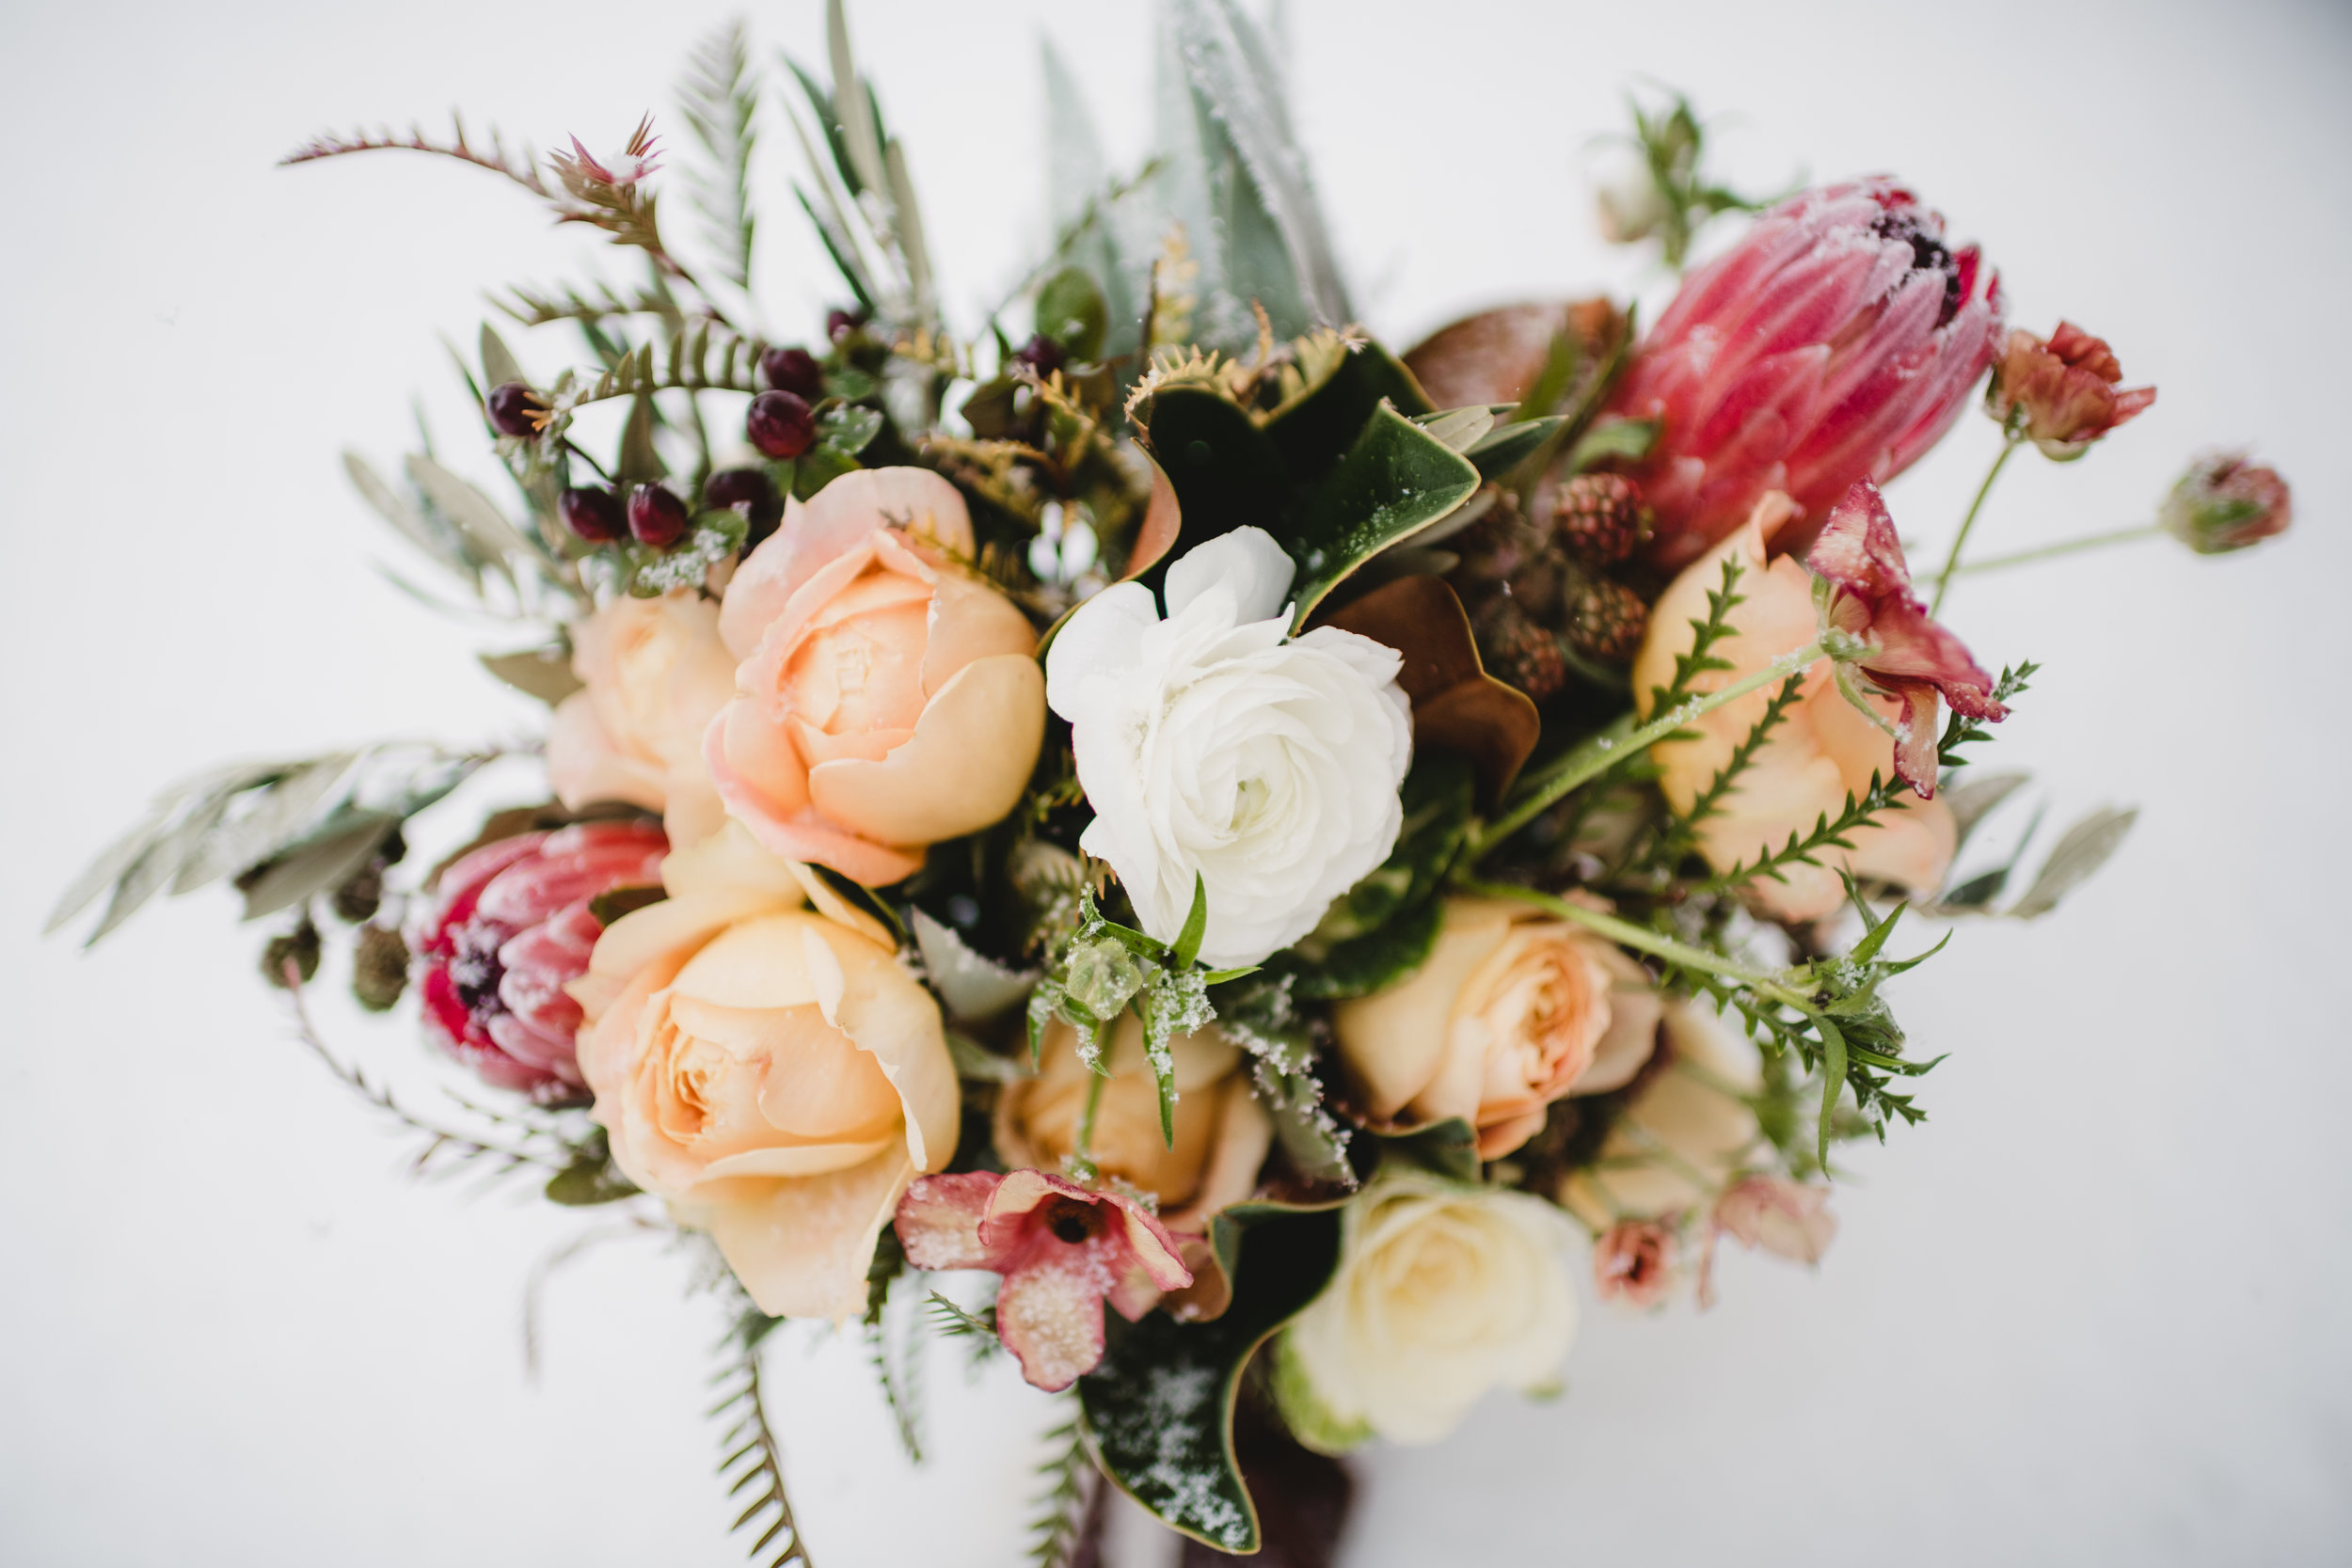 ashley-eileen-floral-design7.jpg